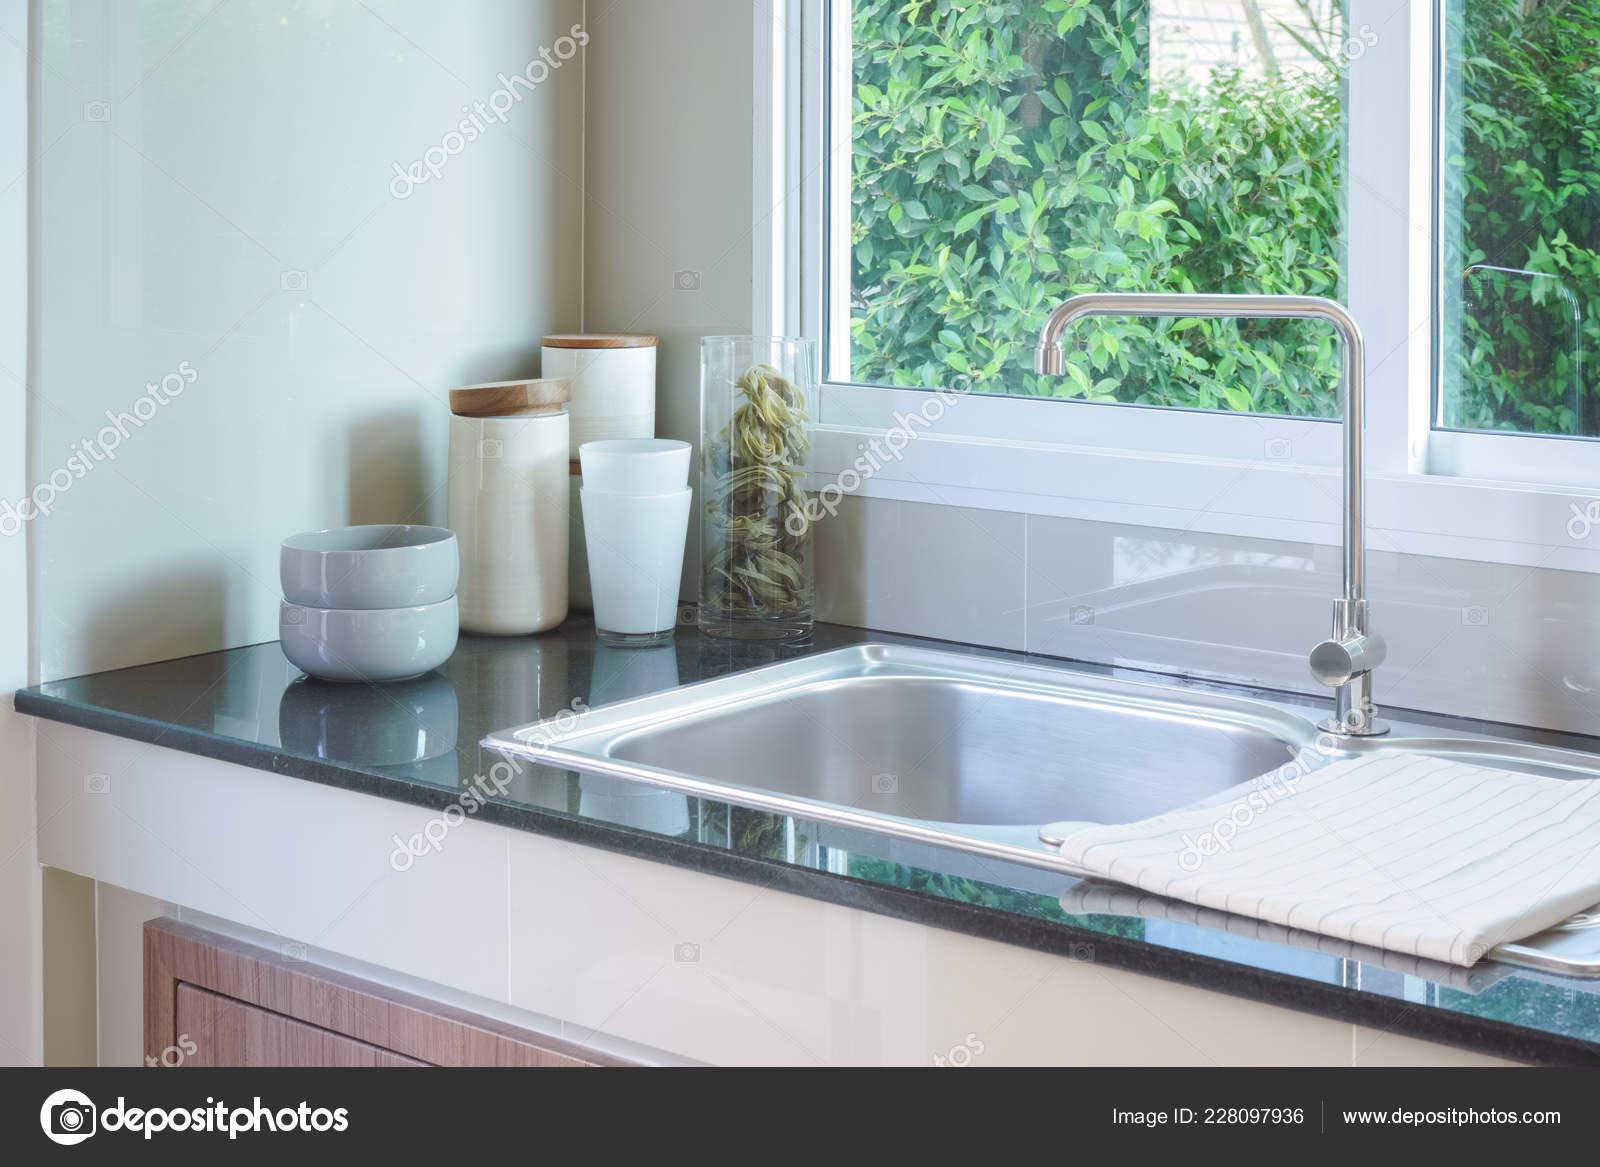 ceramic kitchen top best rated cabinets 干净的厨房水槽柜台顶部配有白色陶瓷餐具 图库照片 c worldwide stock